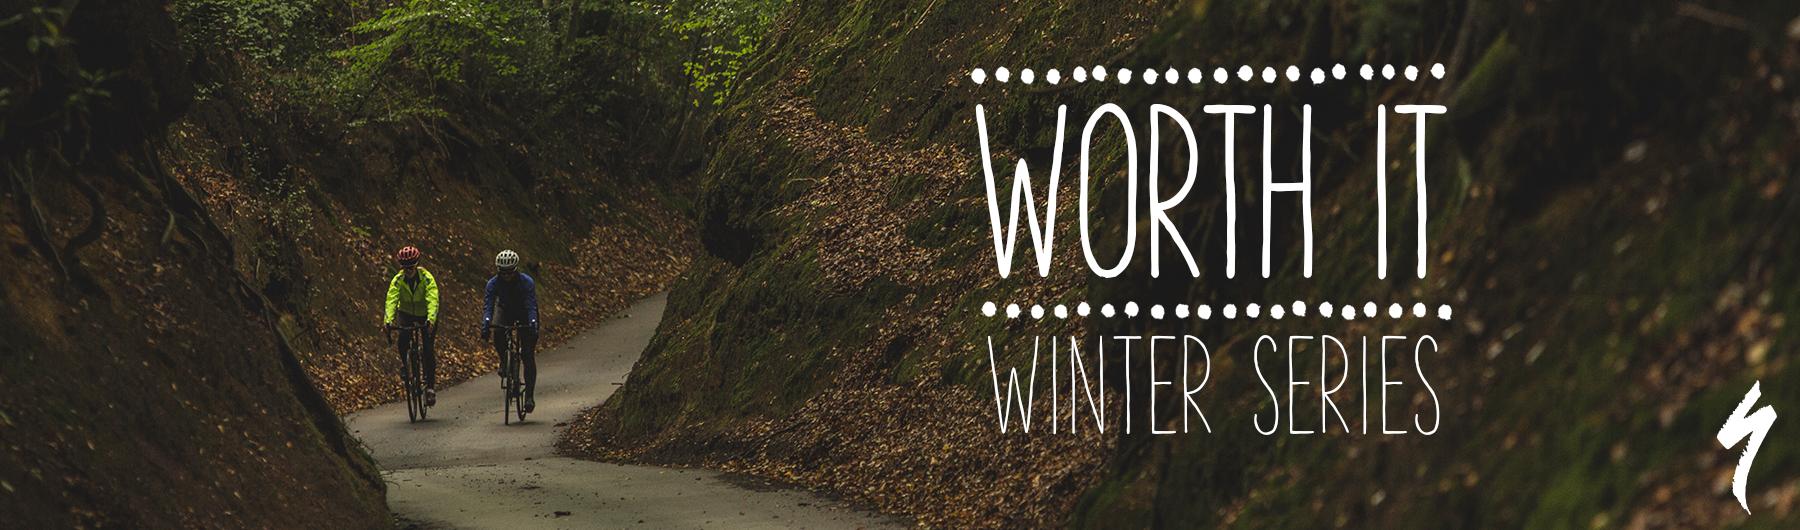 'Worth It - Winter Series'